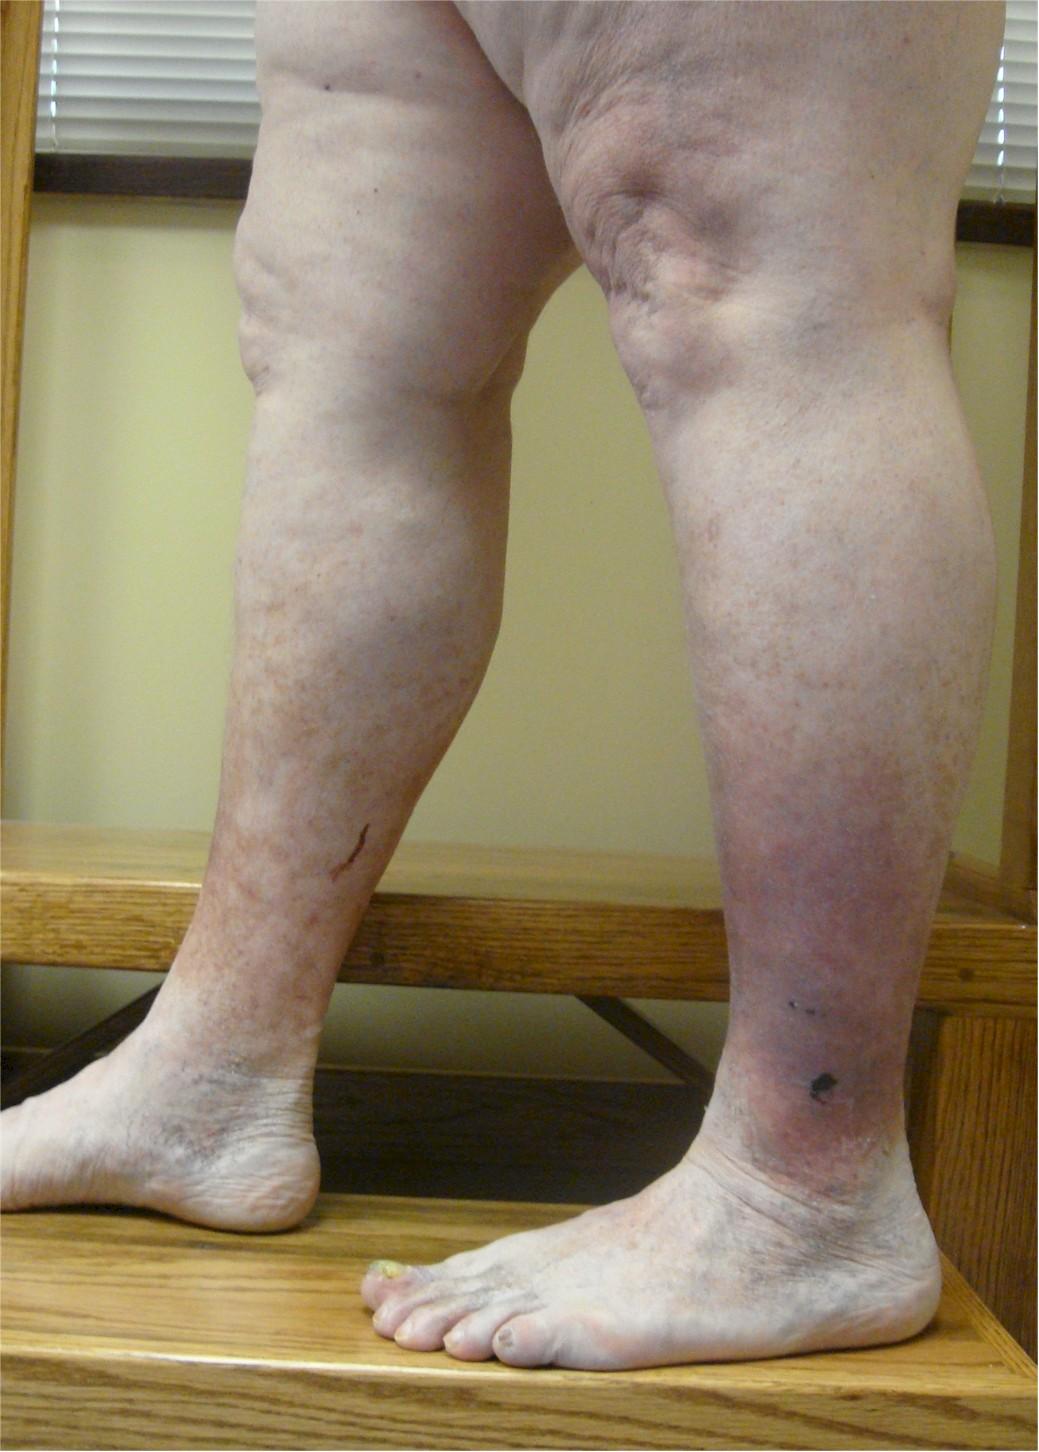 Stasis Dermatitis – Varicose Veins and Skin Problems